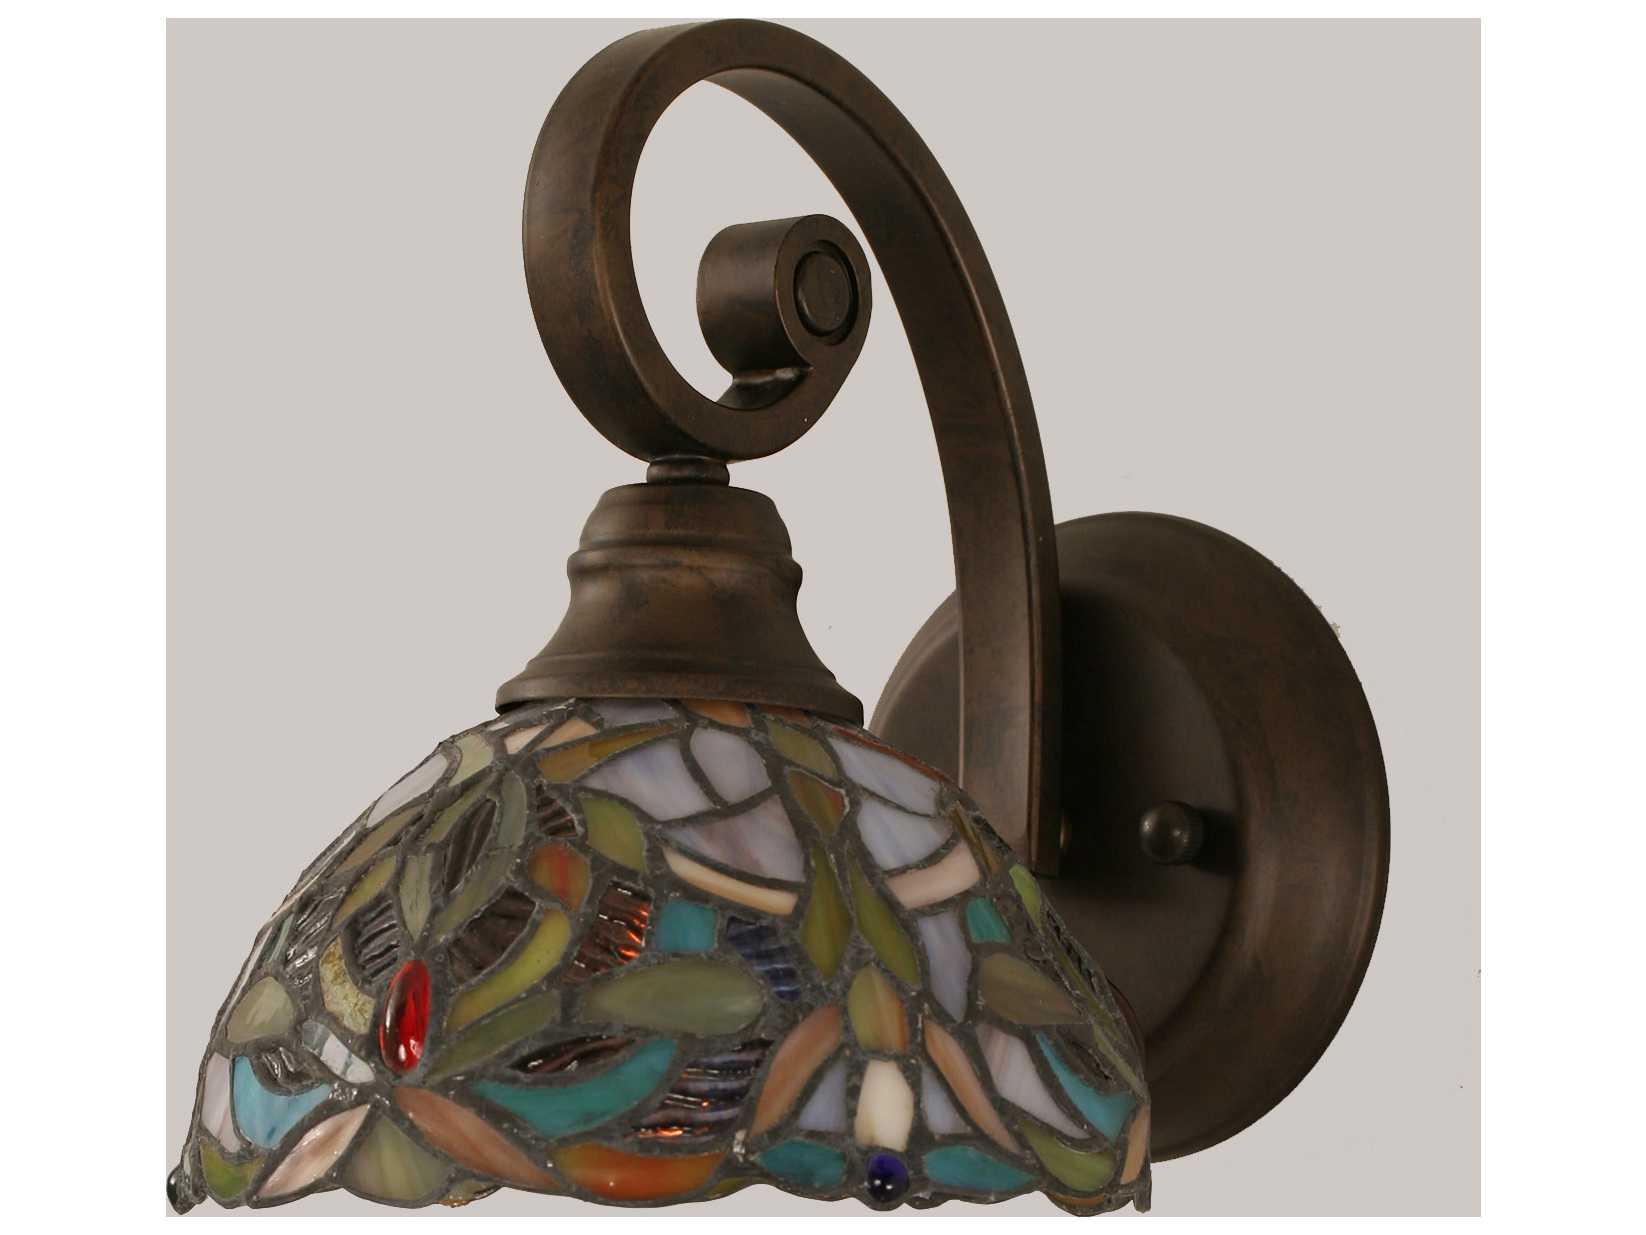 Toltec Lighting Curl Bronze & Kaleidoscope Mini Tiffany Glass Wall Sconce TOL151BRZ9905